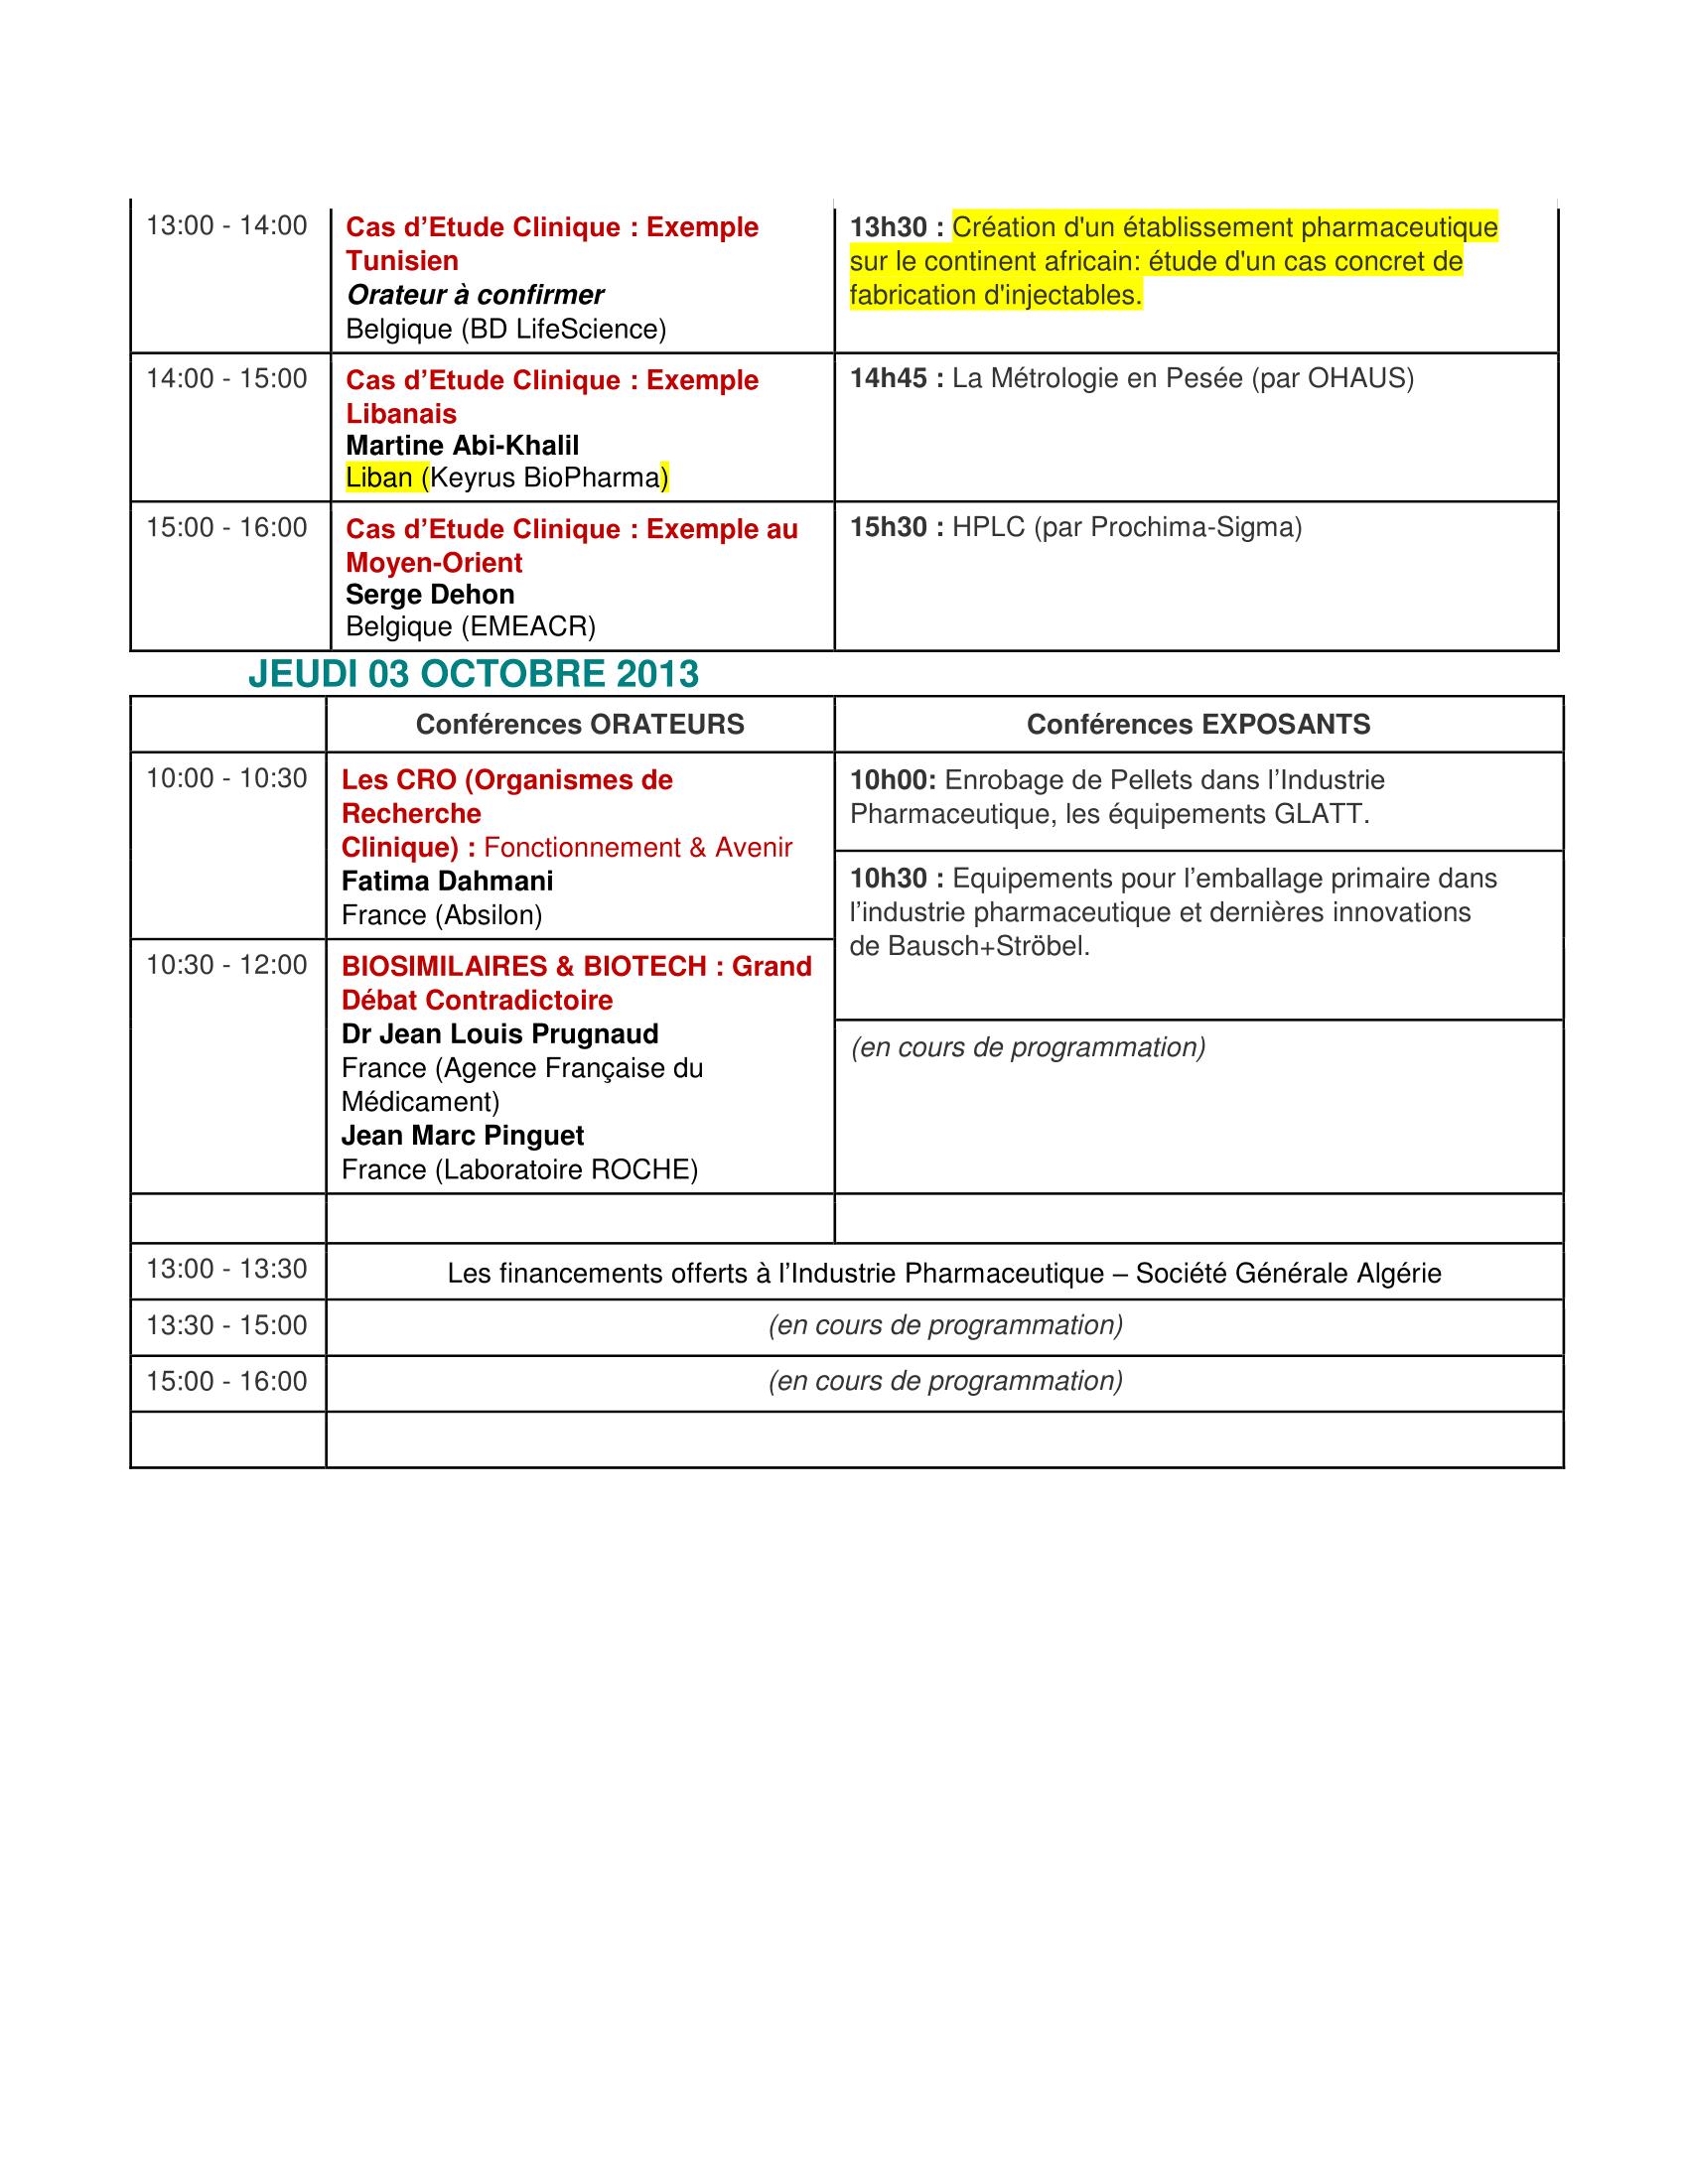 https://pbe-expert.com/wp-content/uploads/2018/04/Programme-des-Conférences_MAGHREB-PHARMA-2013-ORAN-2.png